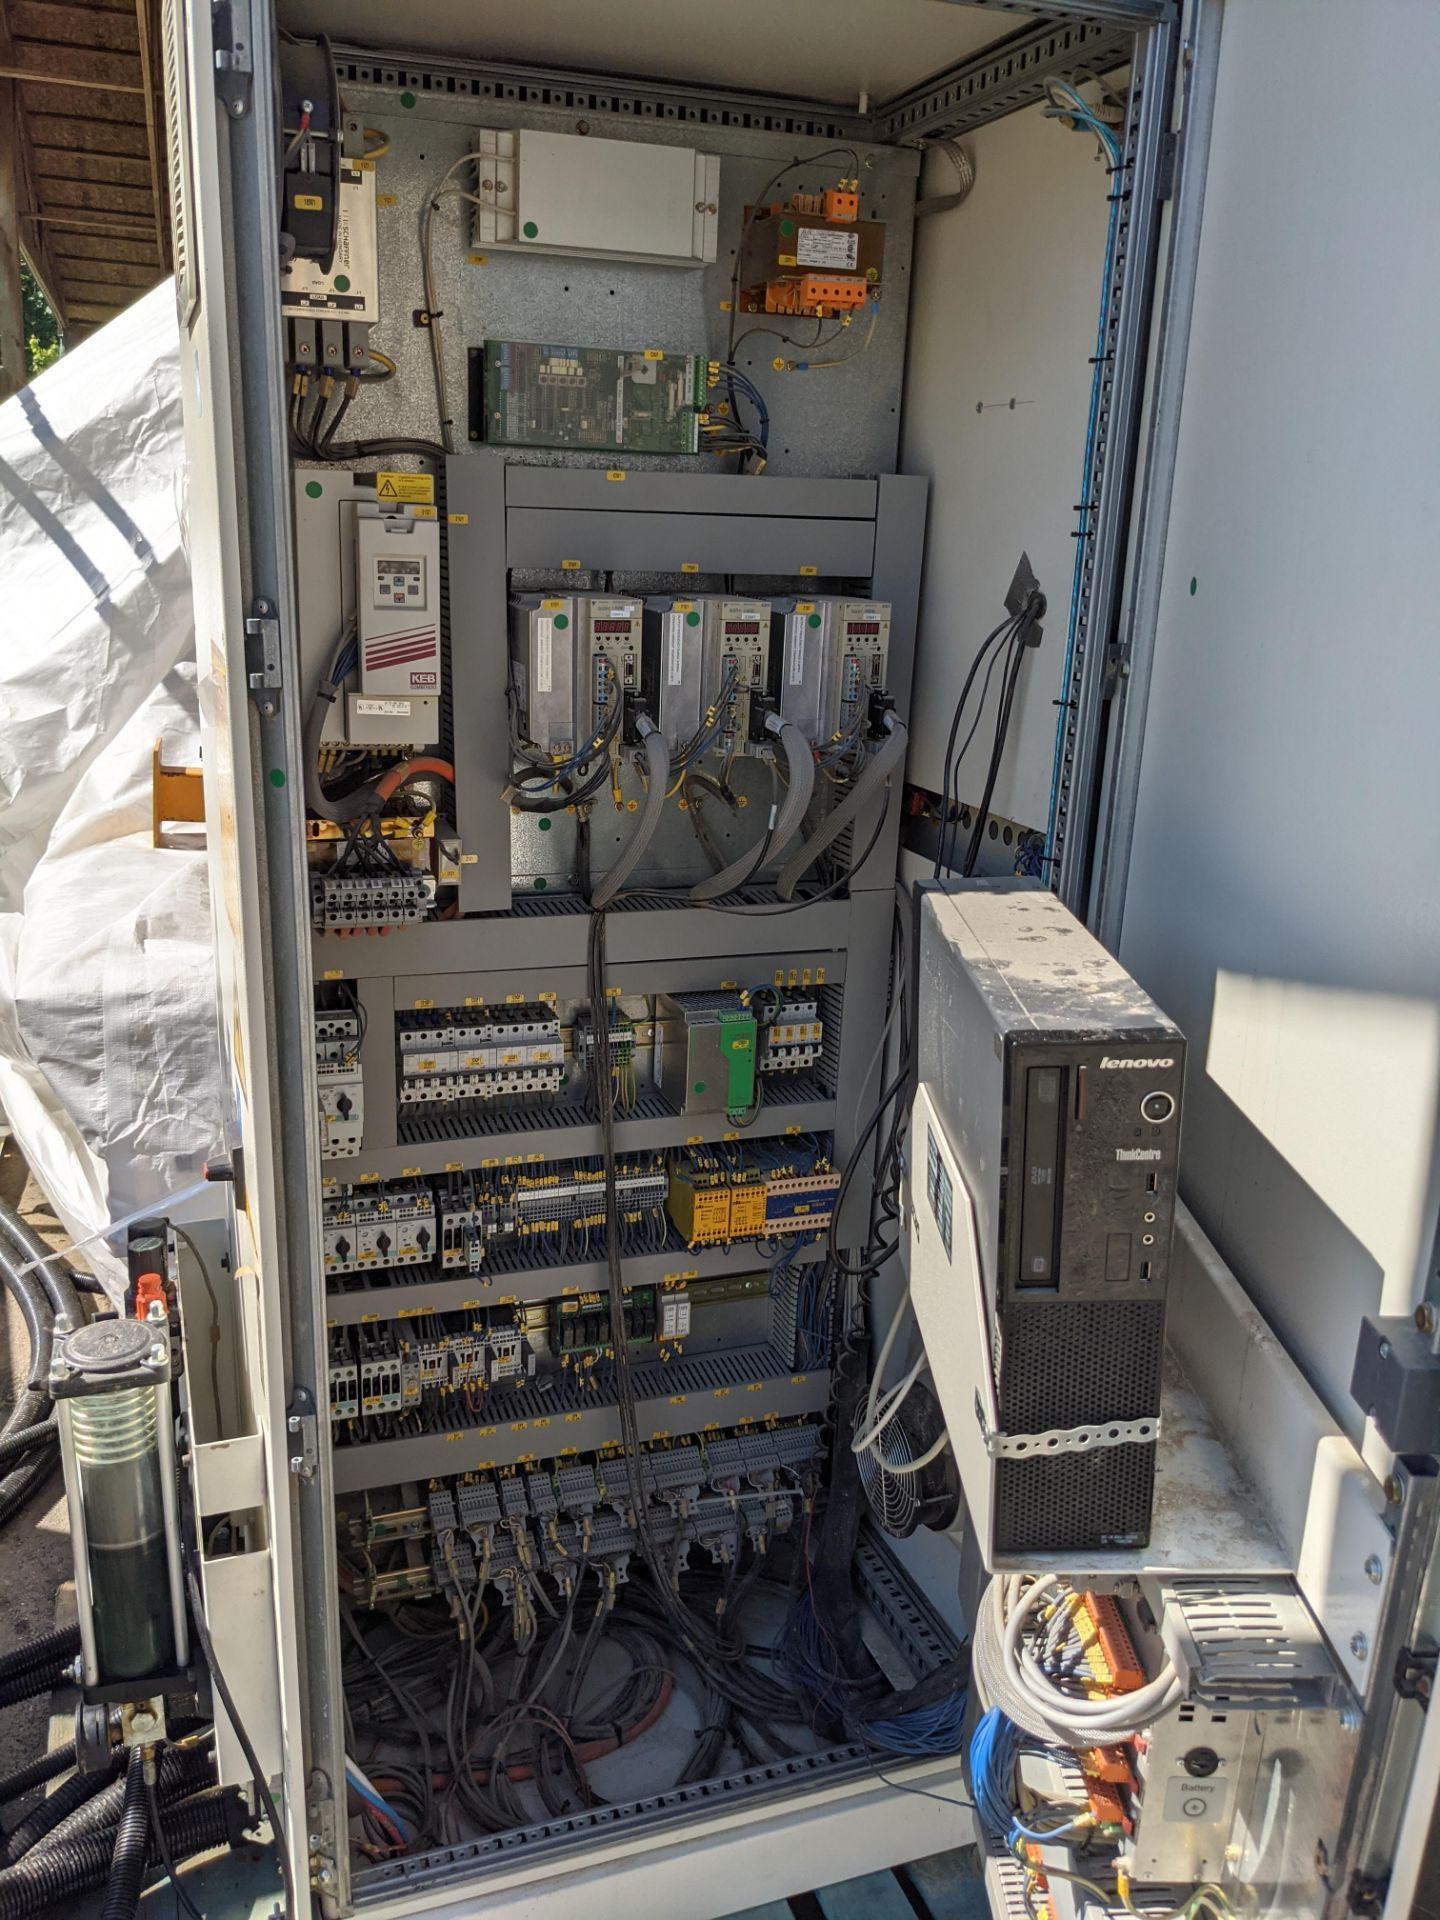 SCM PRATIX 48 NST CNC Nesting Machine with 2 Transformers and 2 Vacuum Pumps - Image 5 of 5